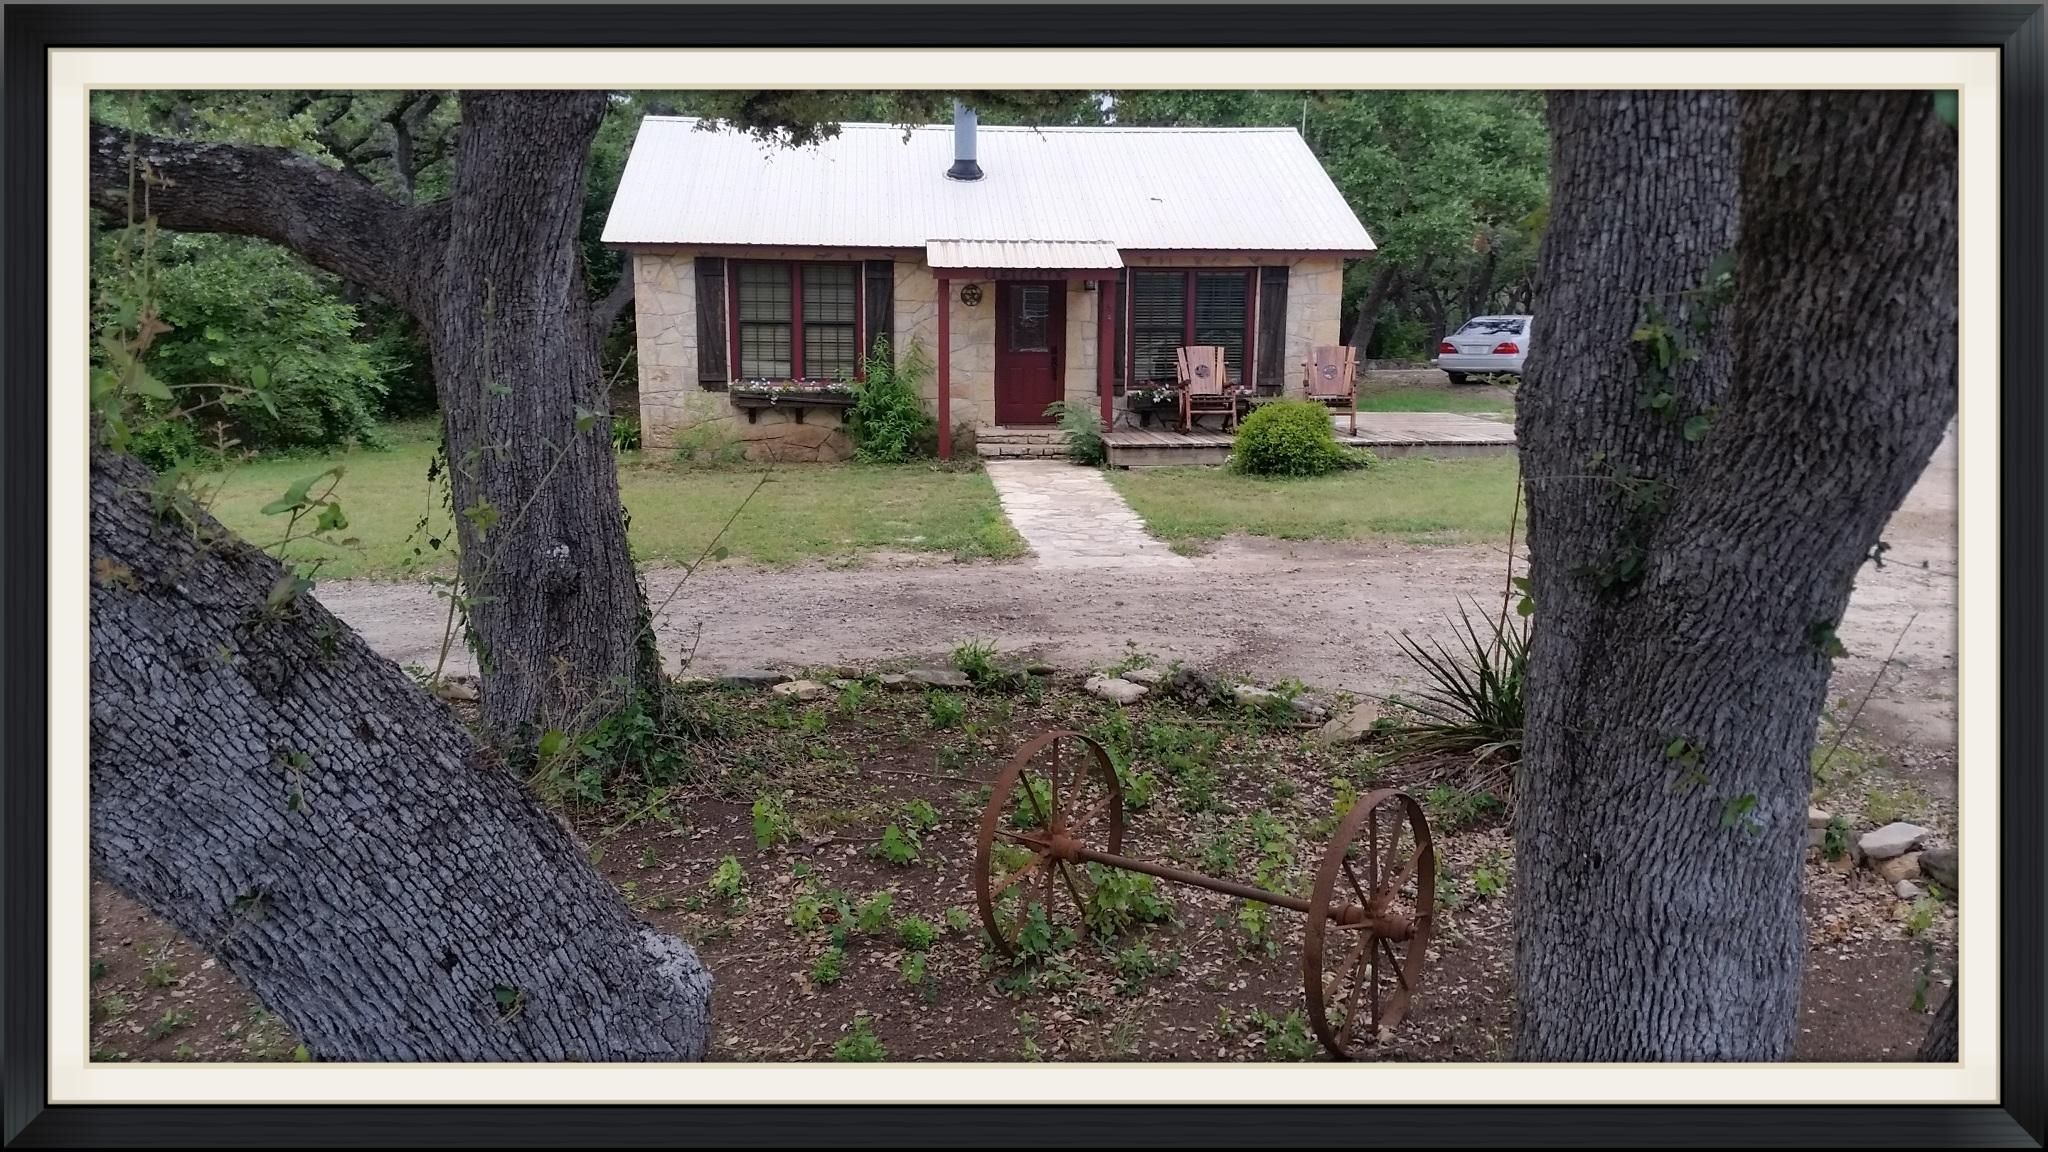 cottage 6-28-16.jpg